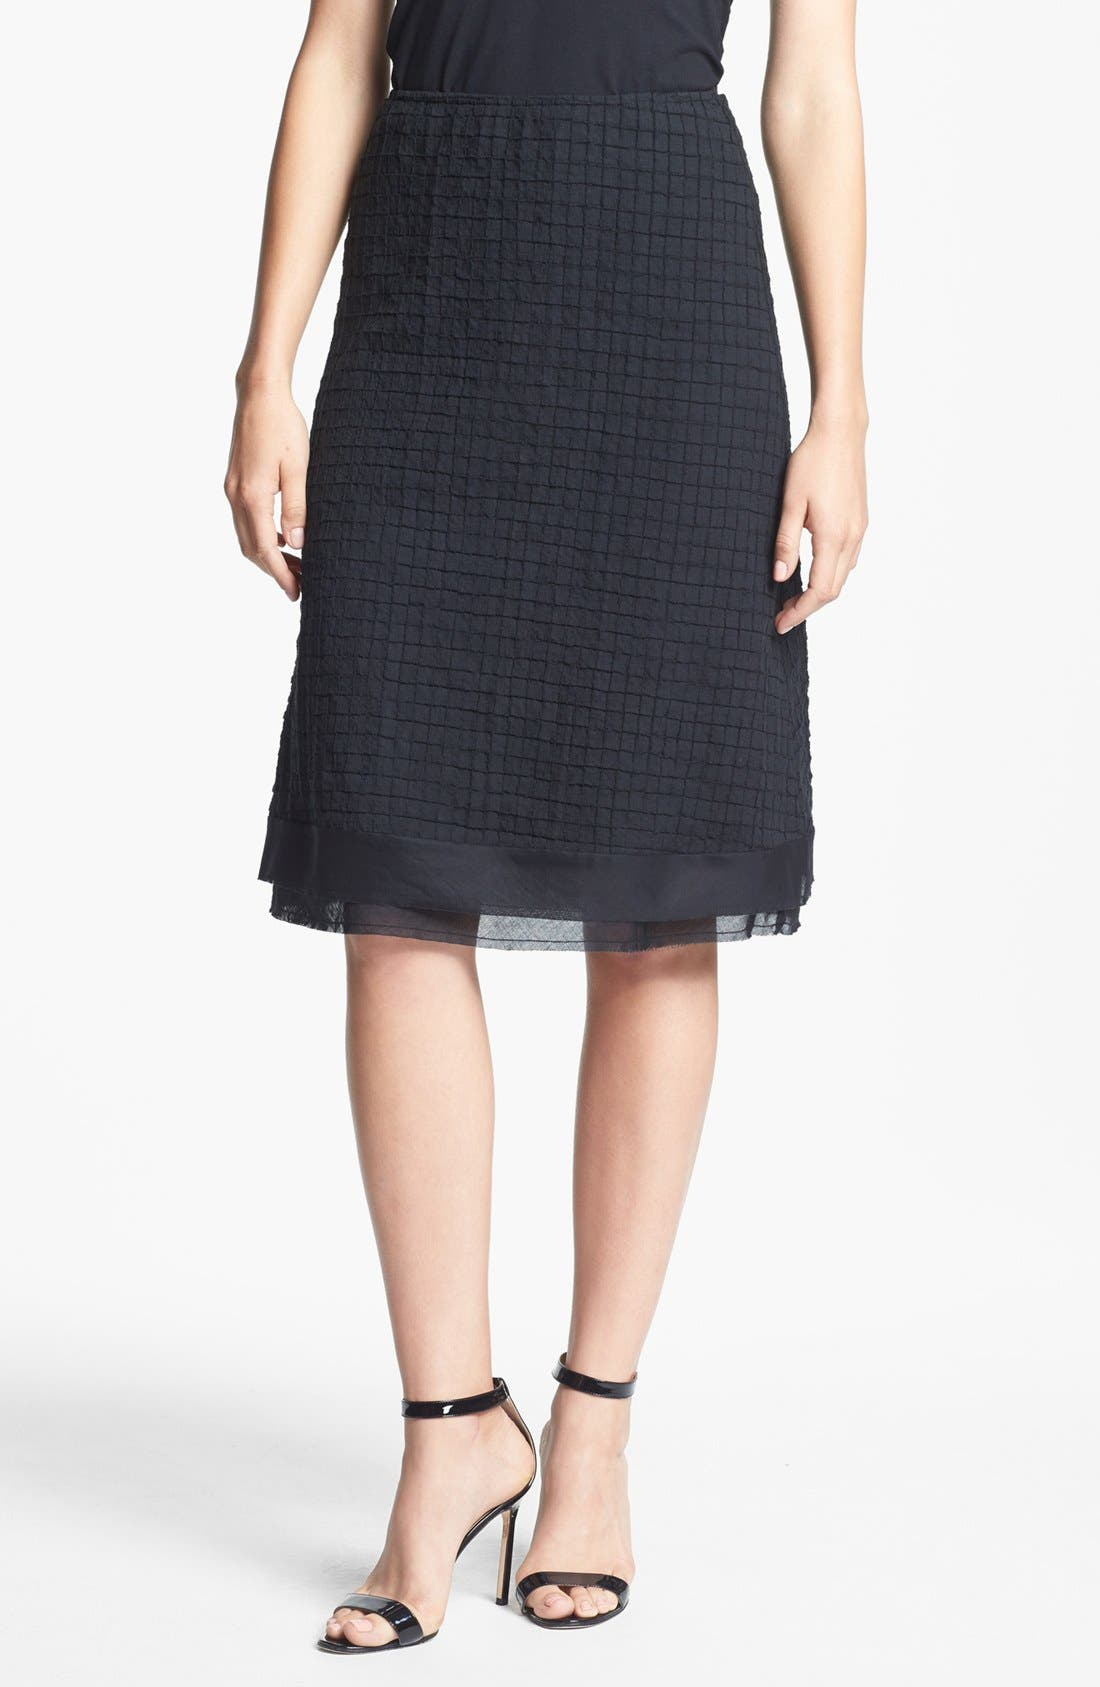 Alternate Image 1 Selected - Eileen Fisher A-Line Skirt (Regular & Petite)